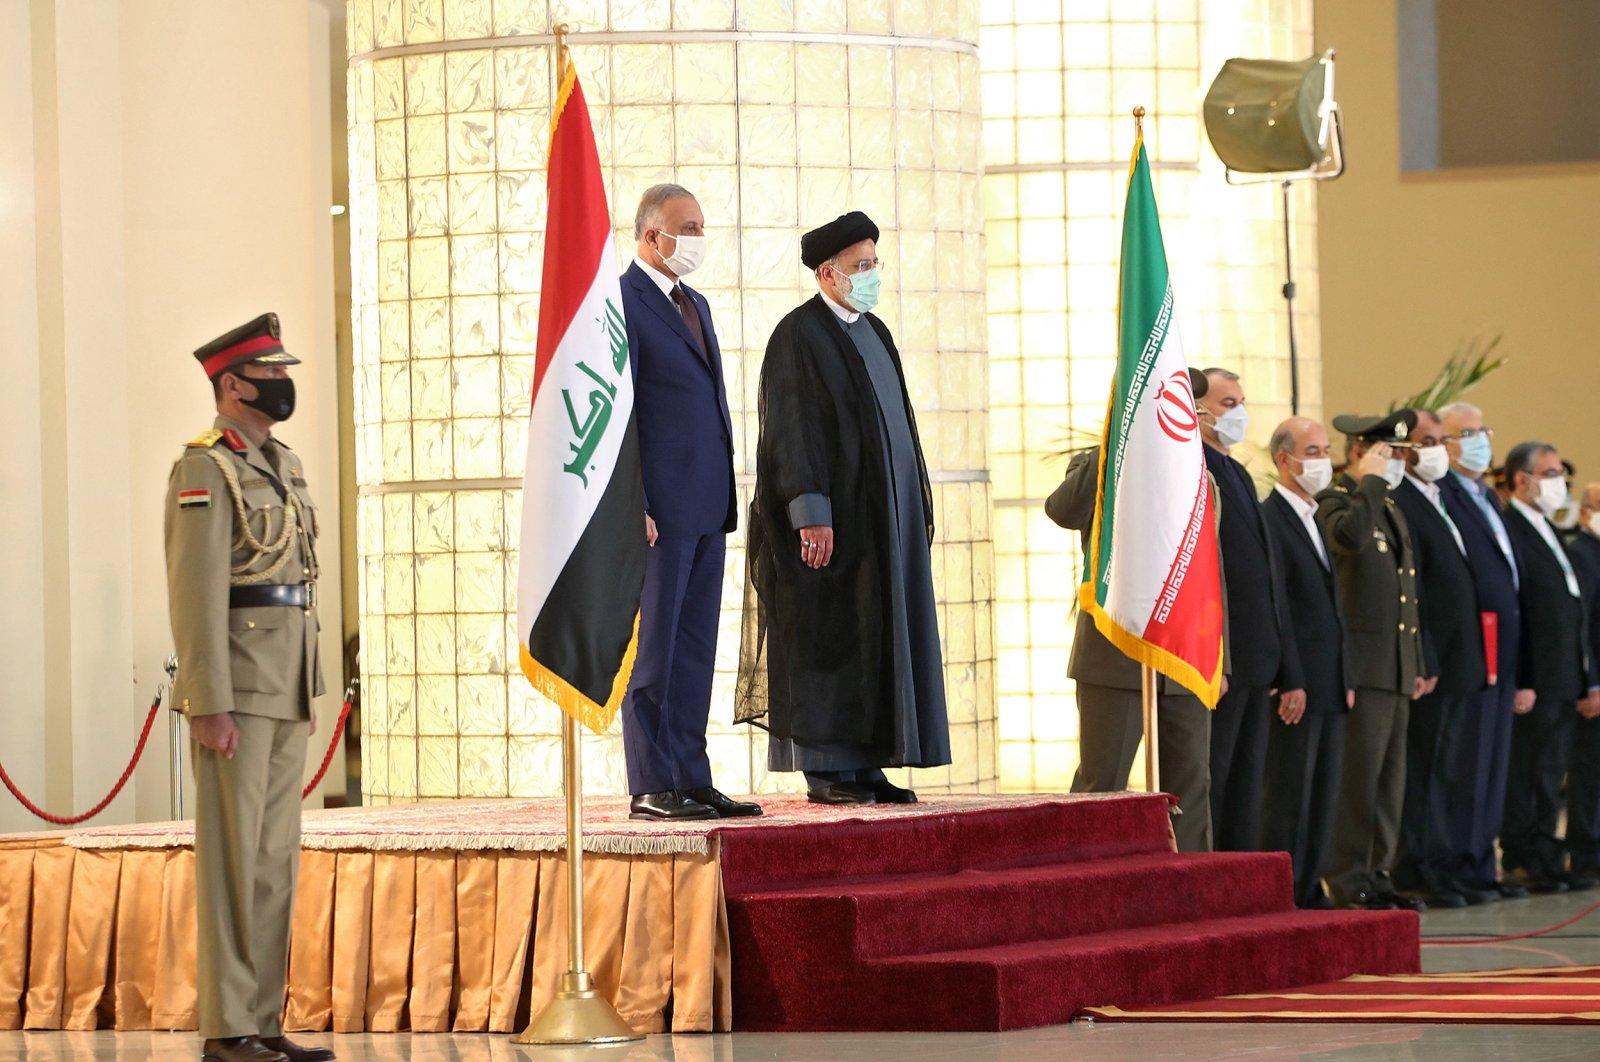 A handout picture provided by the Iranian presidency on September 12, 2021, shows President Ebrahim Raisi (C) receiving Iraqi Prime Minister Mustafa Al-Kadhemi (L) in the capital Tehran. (AFP Photo/HO/Iranian Presidency)